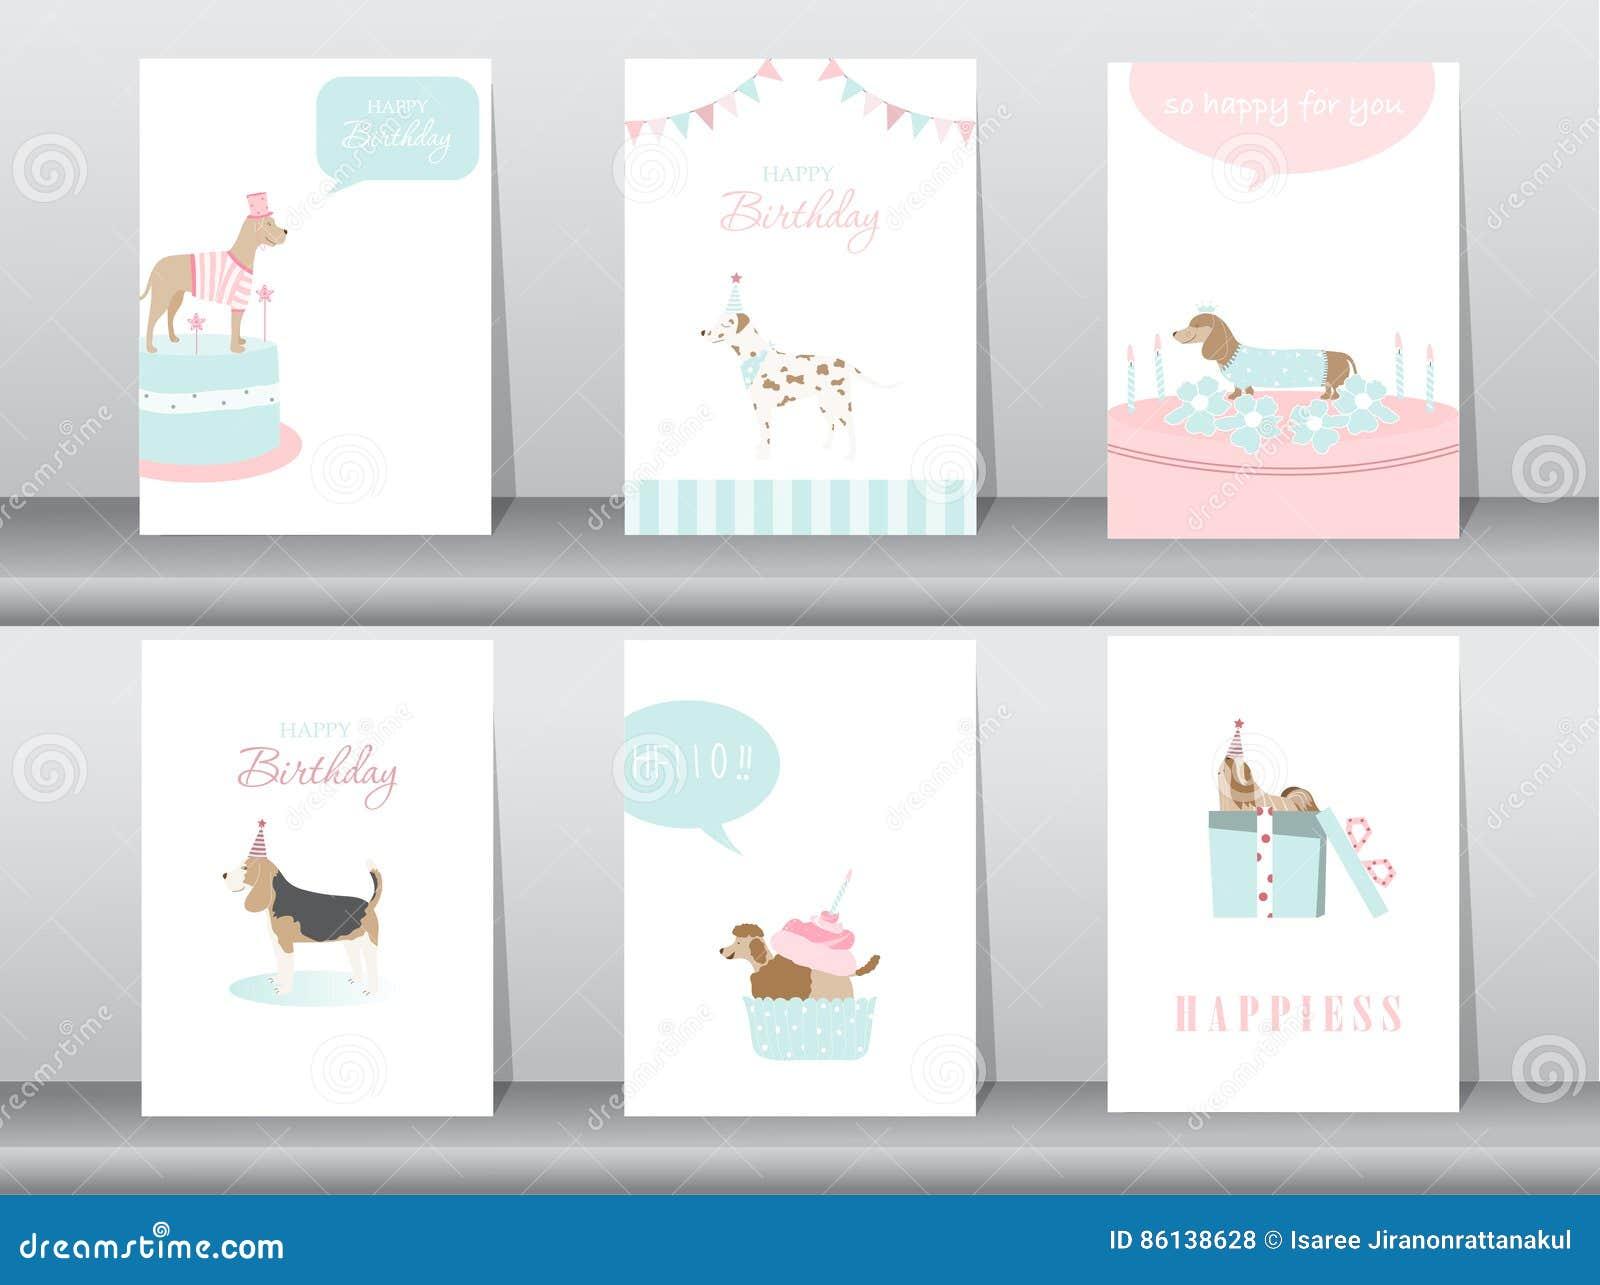 Set Of Birthday Invitations Cardspostergreetingtemplateanimalsdogs